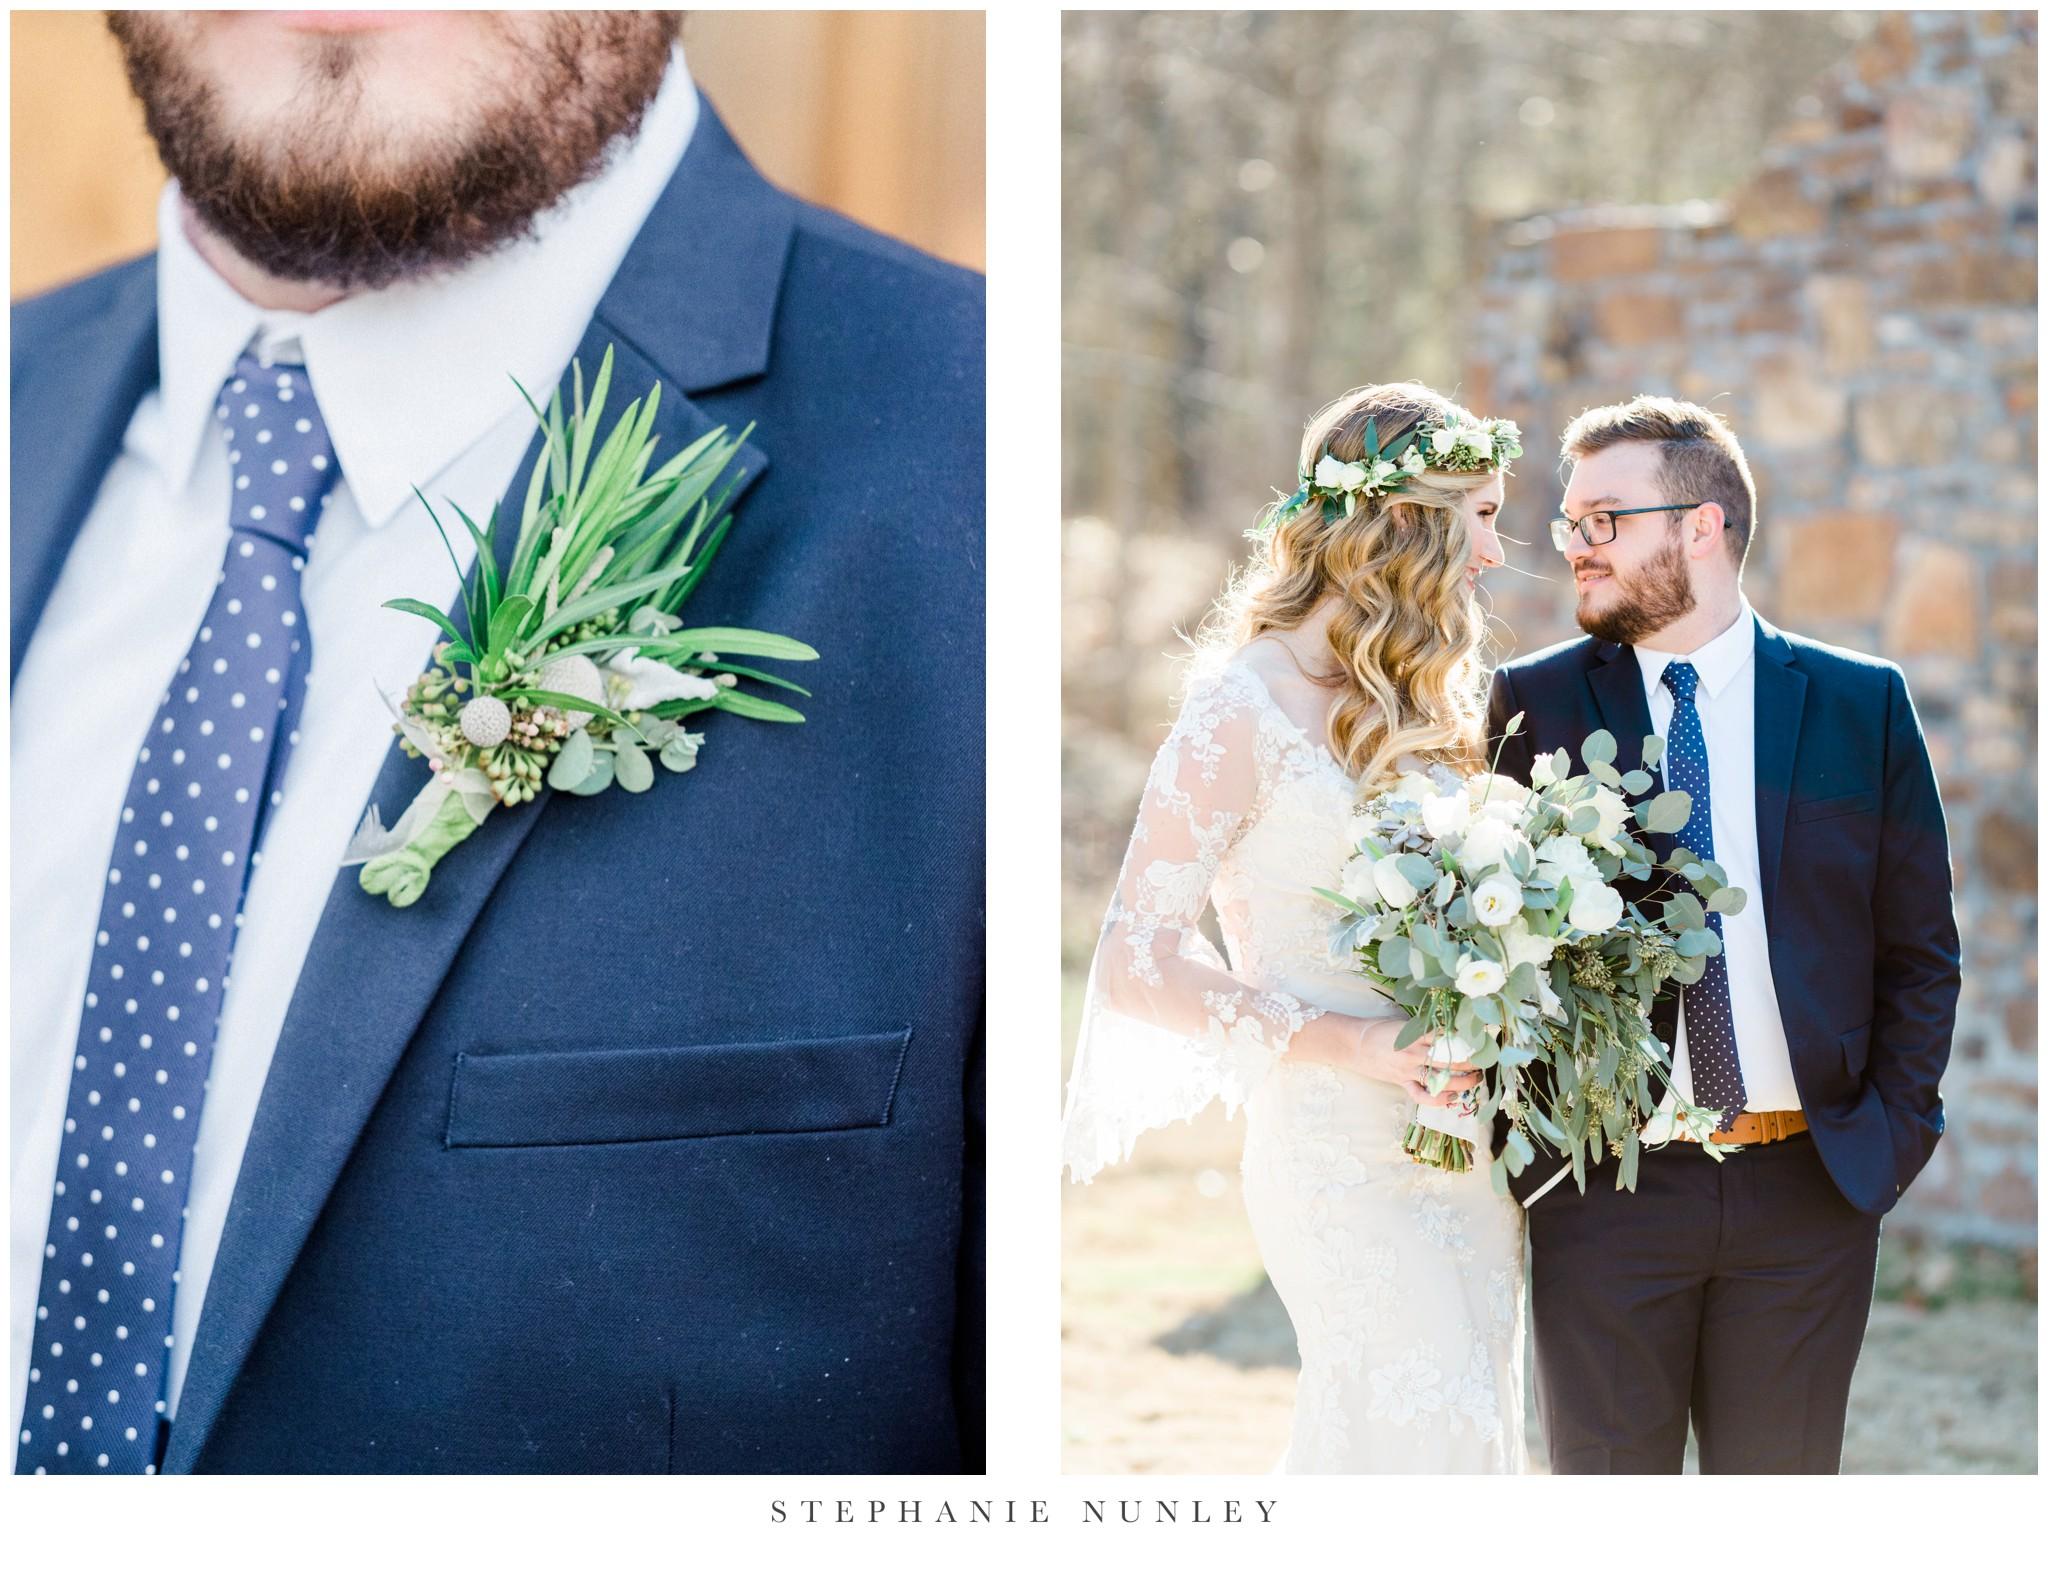 sassafrass-springs-vineyard-film-wedding-photos-42.jpg